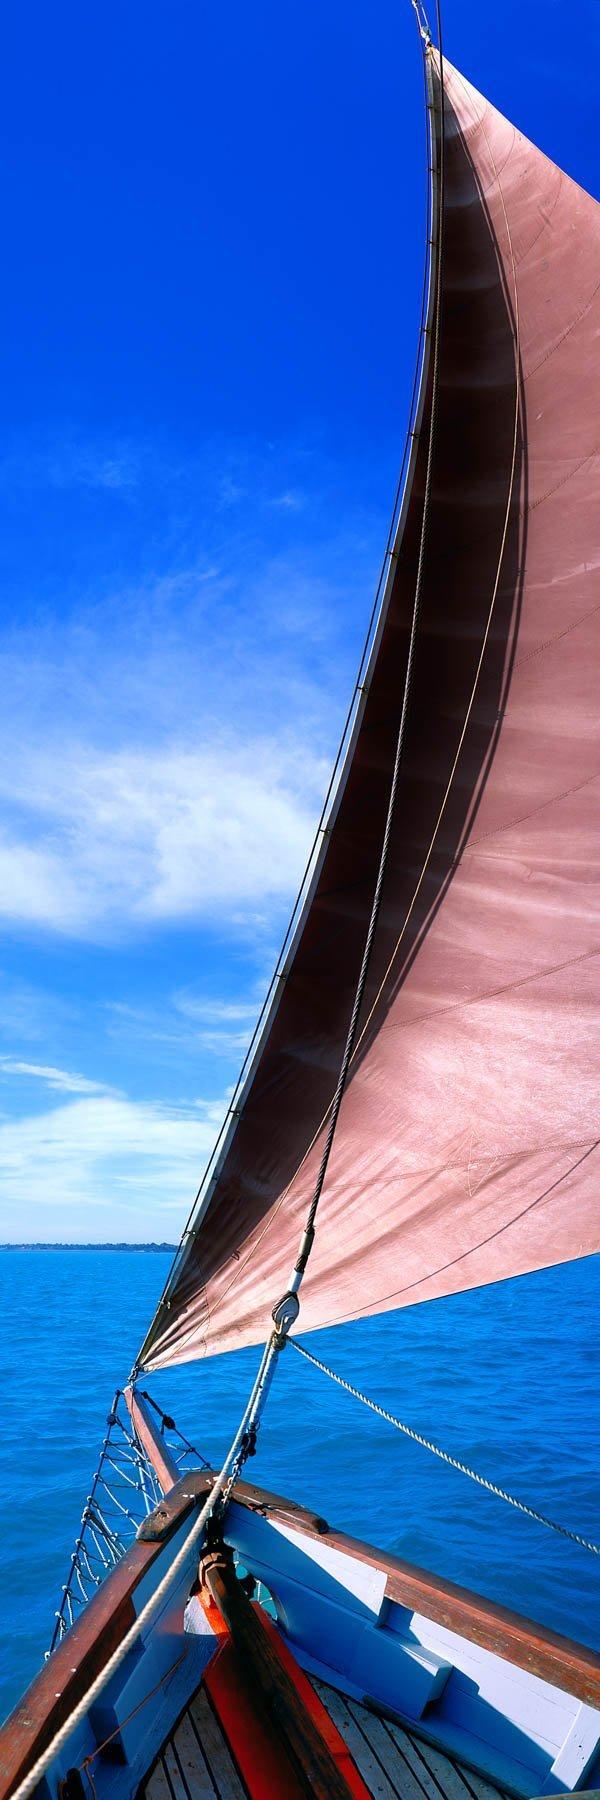 The pearling lugger, Cornelius, off the coast of Broome, WA, Australia.